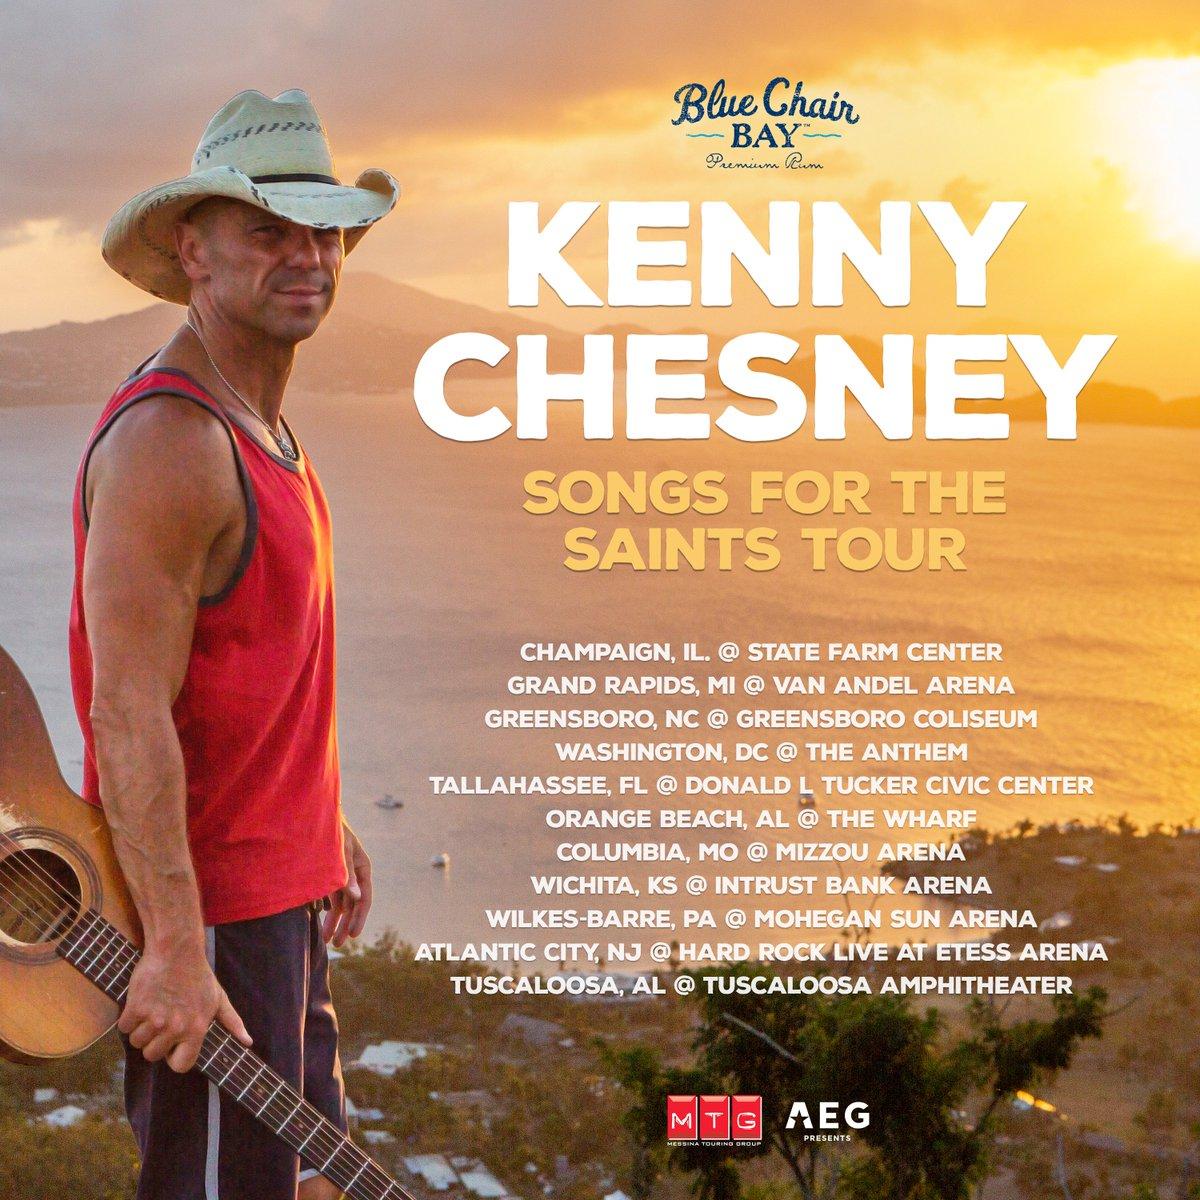 Kenny Chesney on Twitter